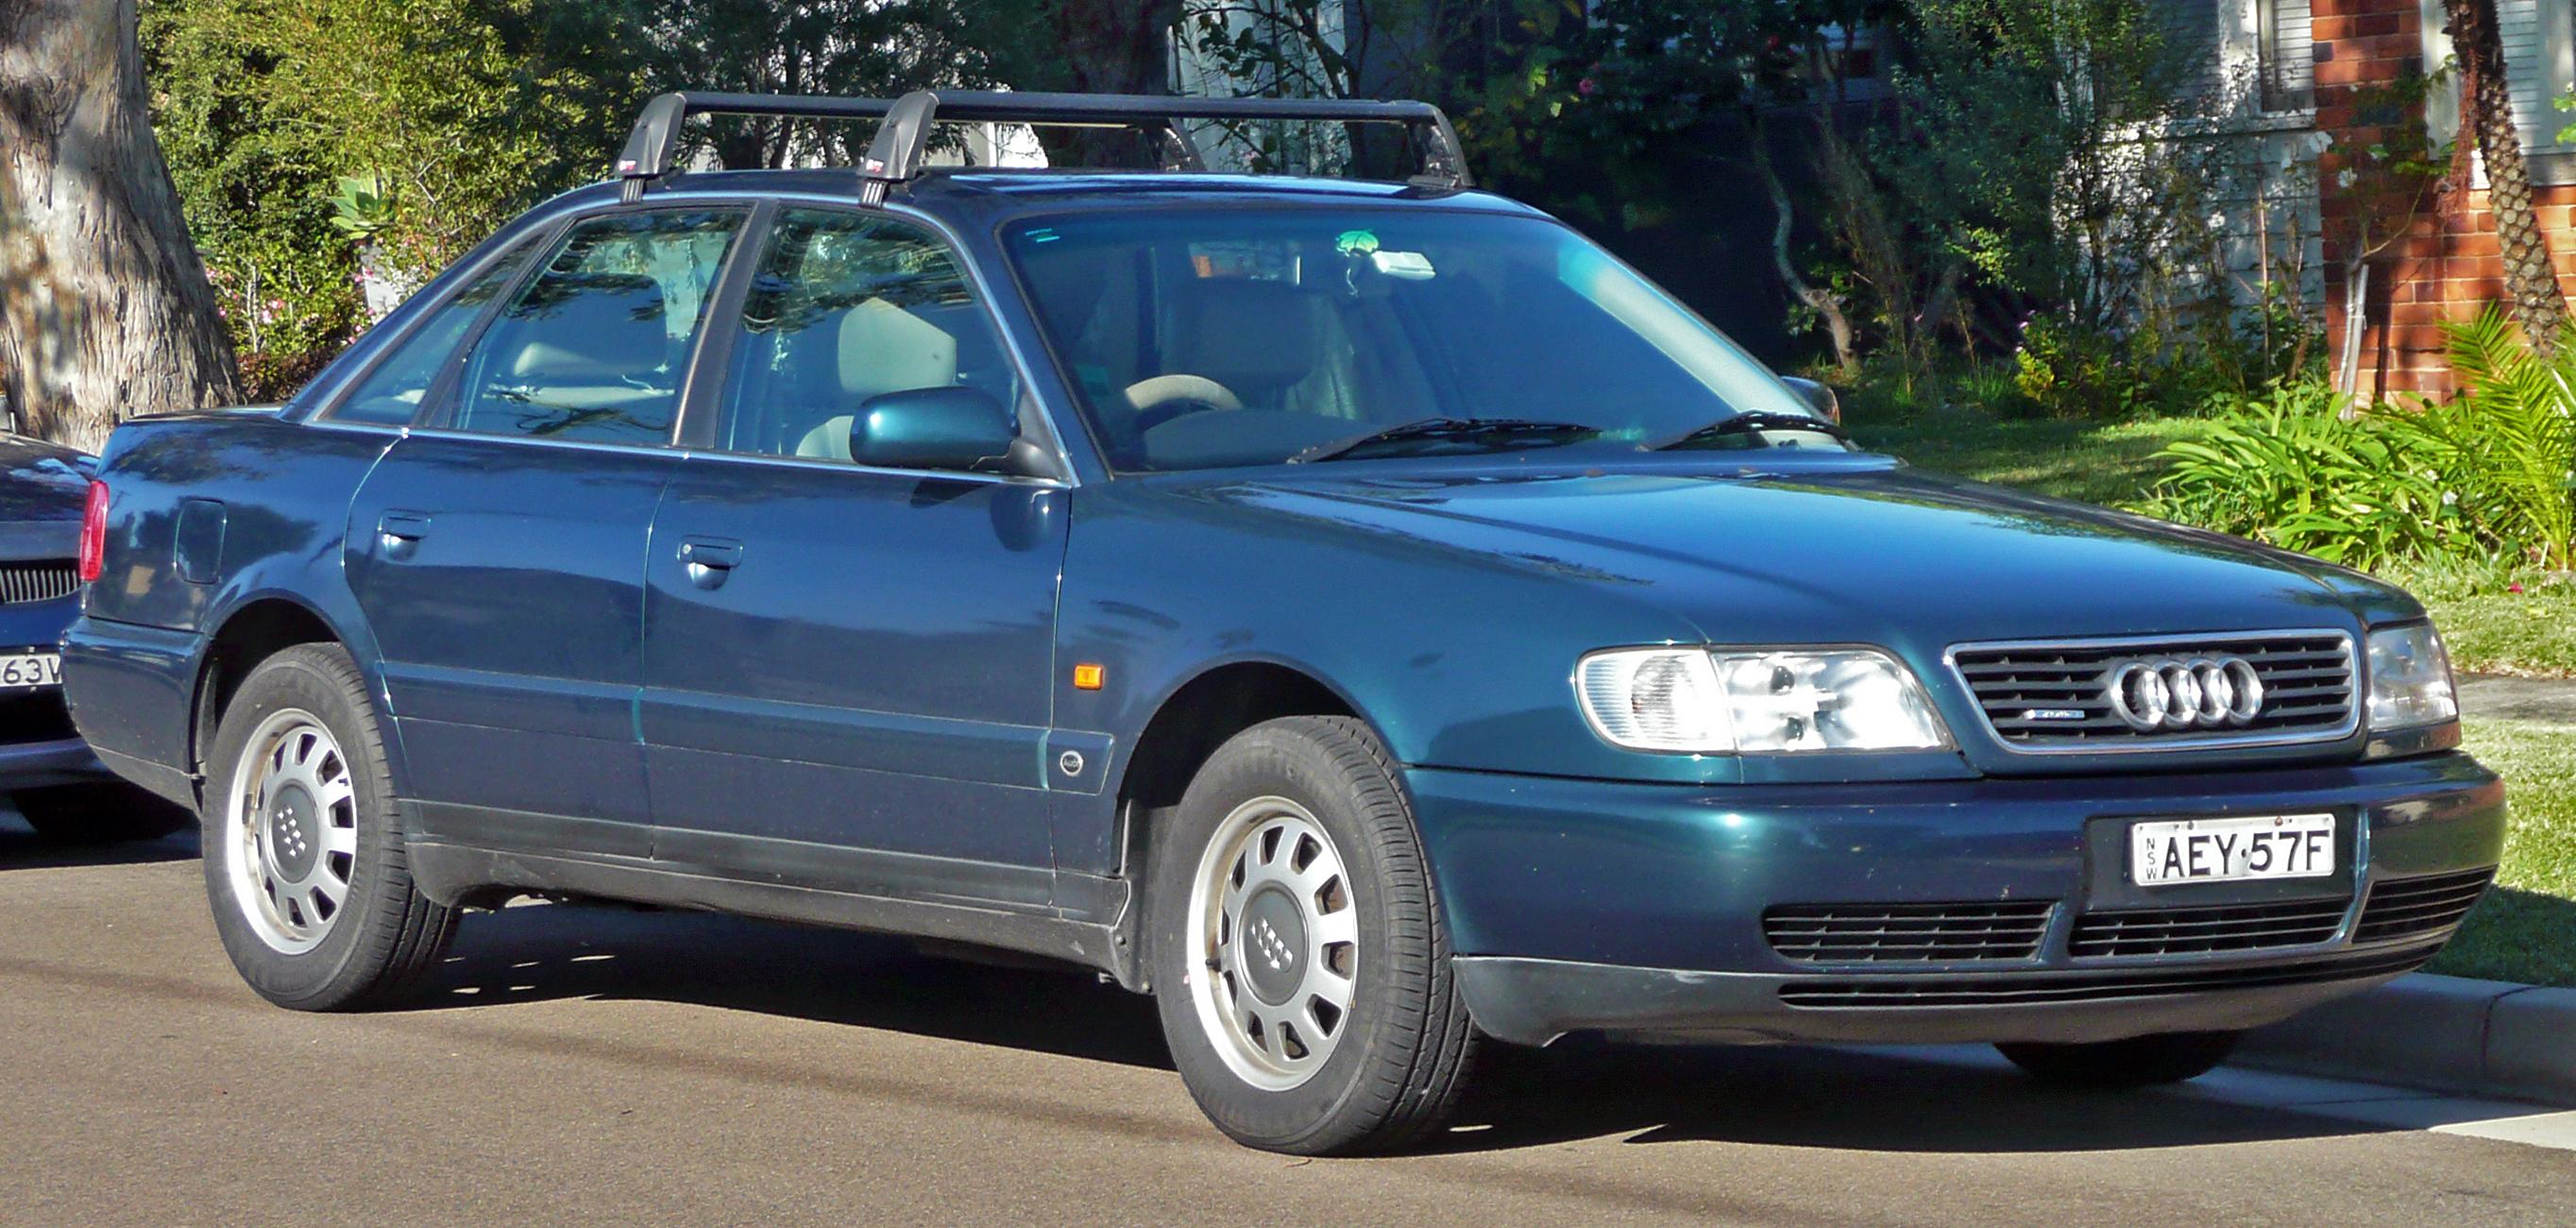 File:1994-1997 Audi A6 (4A) 2.6 quattro sedan 01.jpg